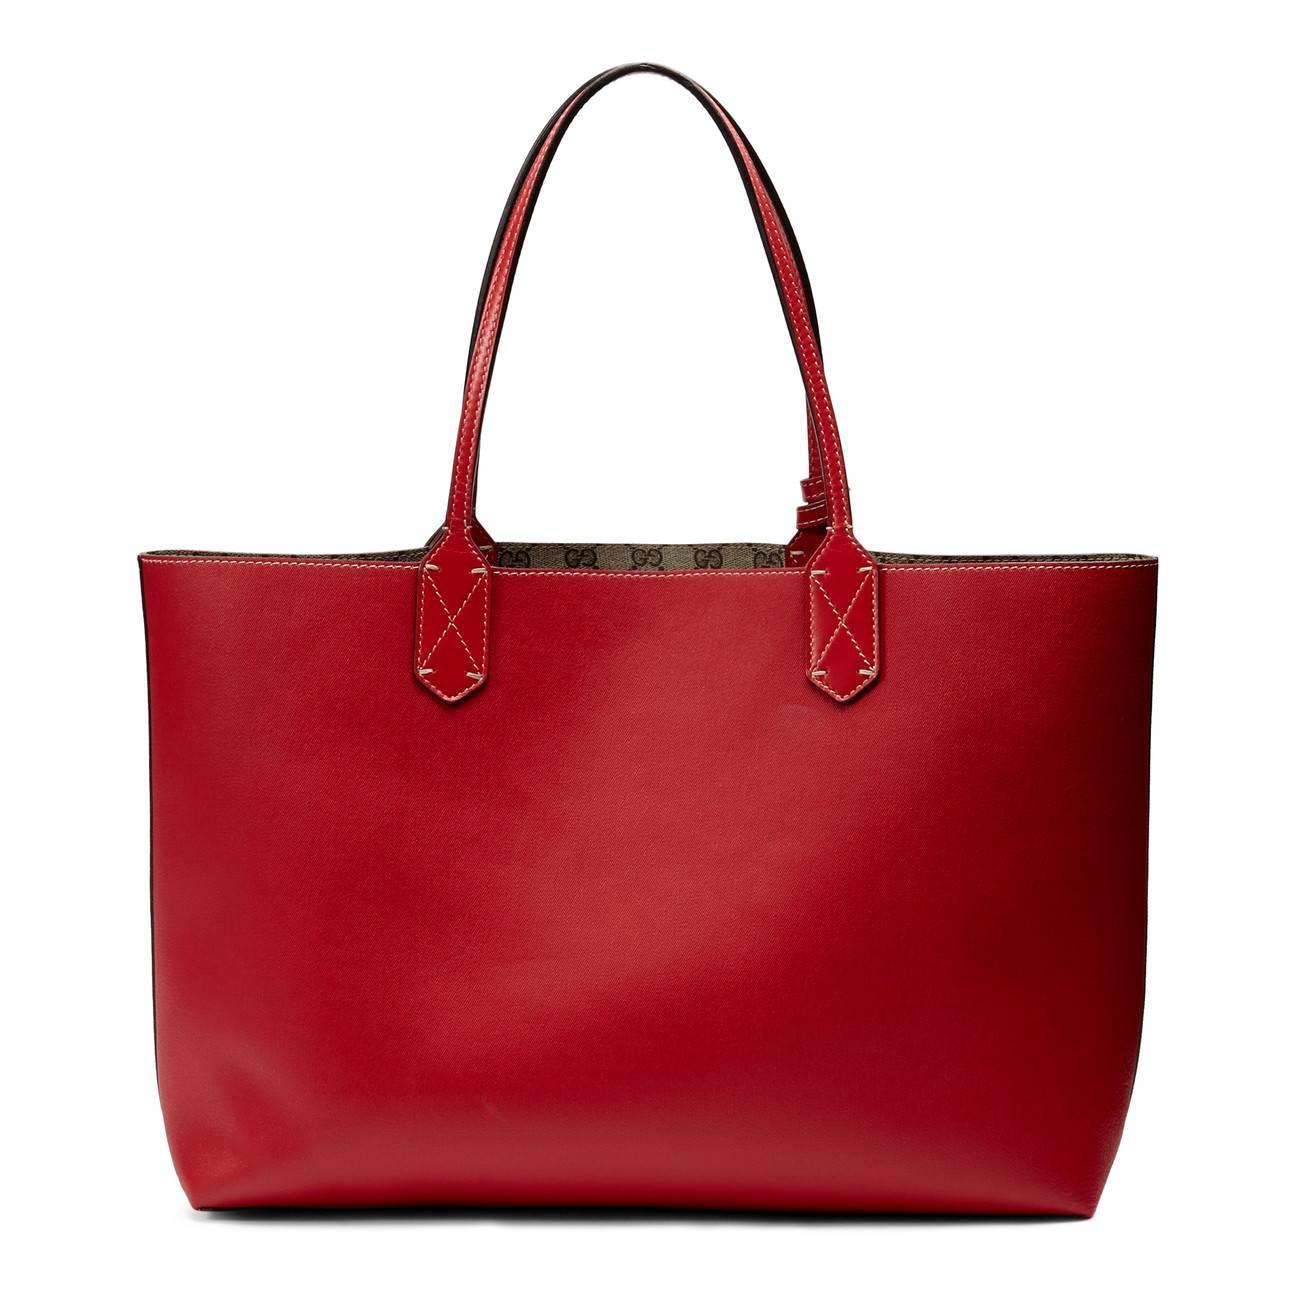 3085c1e4e5df Gucci - Red Reversible GG Medium Tote - Lyst. View fullscreen